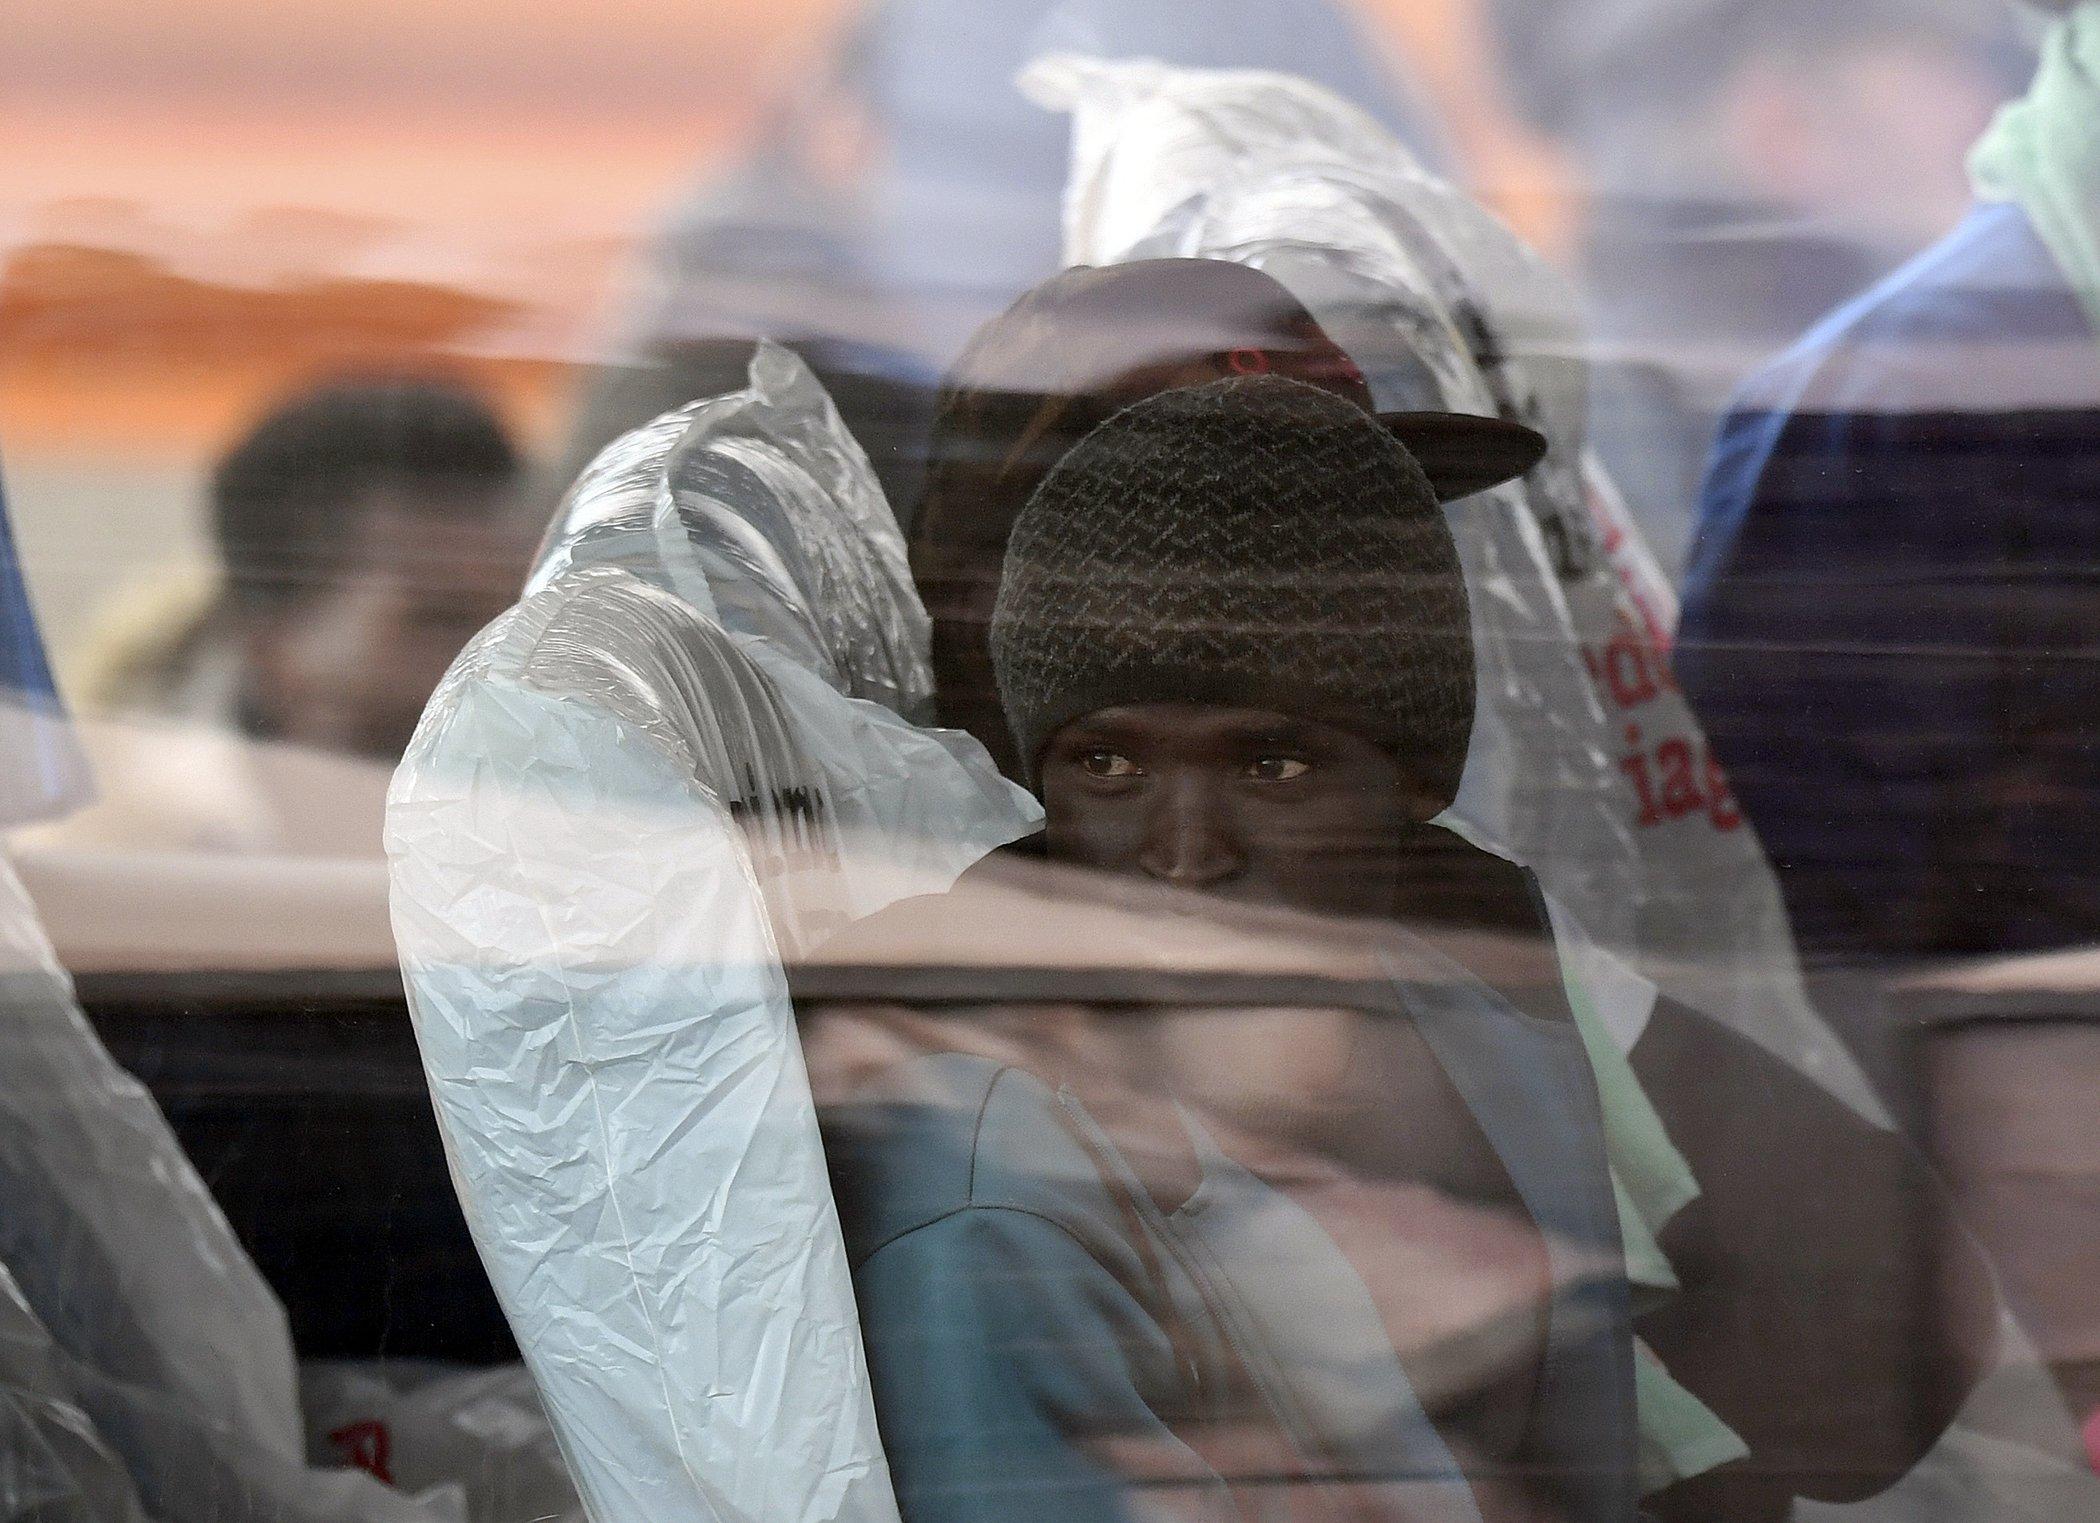 Migrant-Crisis-Europe-North-Africa.jpg